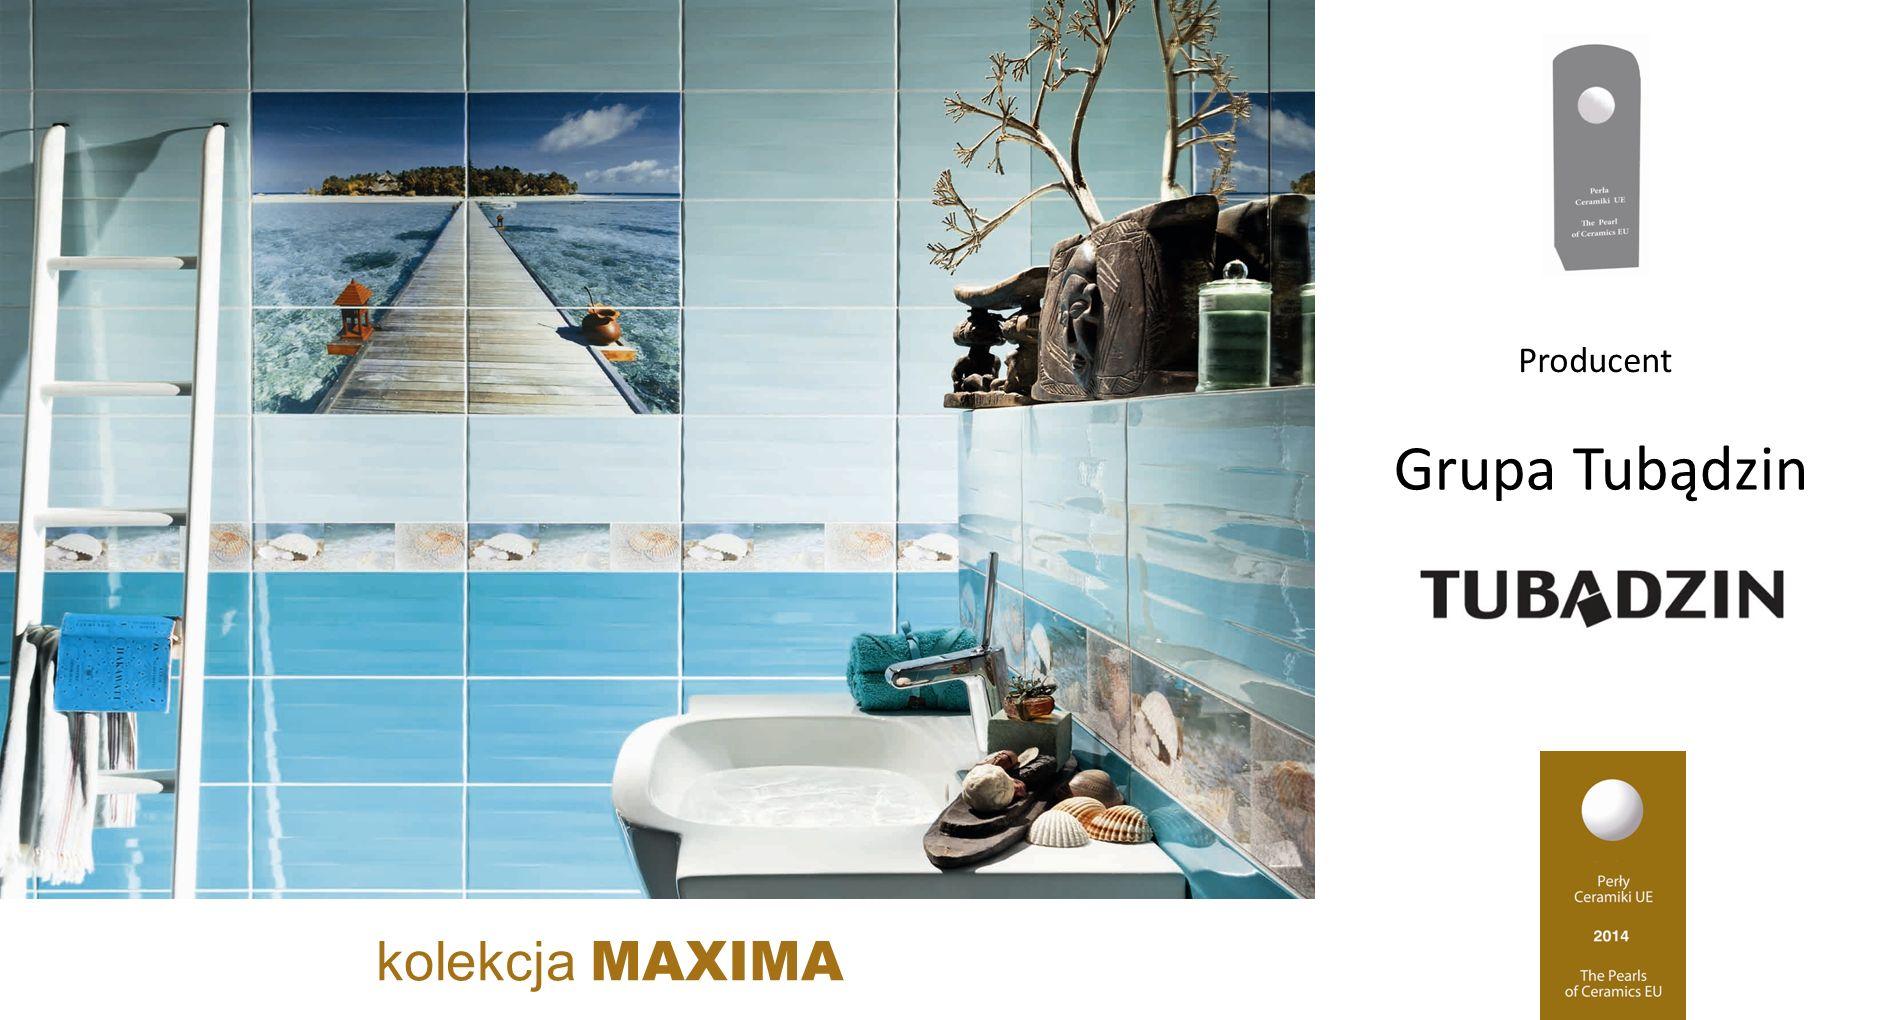 Grupa Tubądzin kolekcja MAXIMA Producent